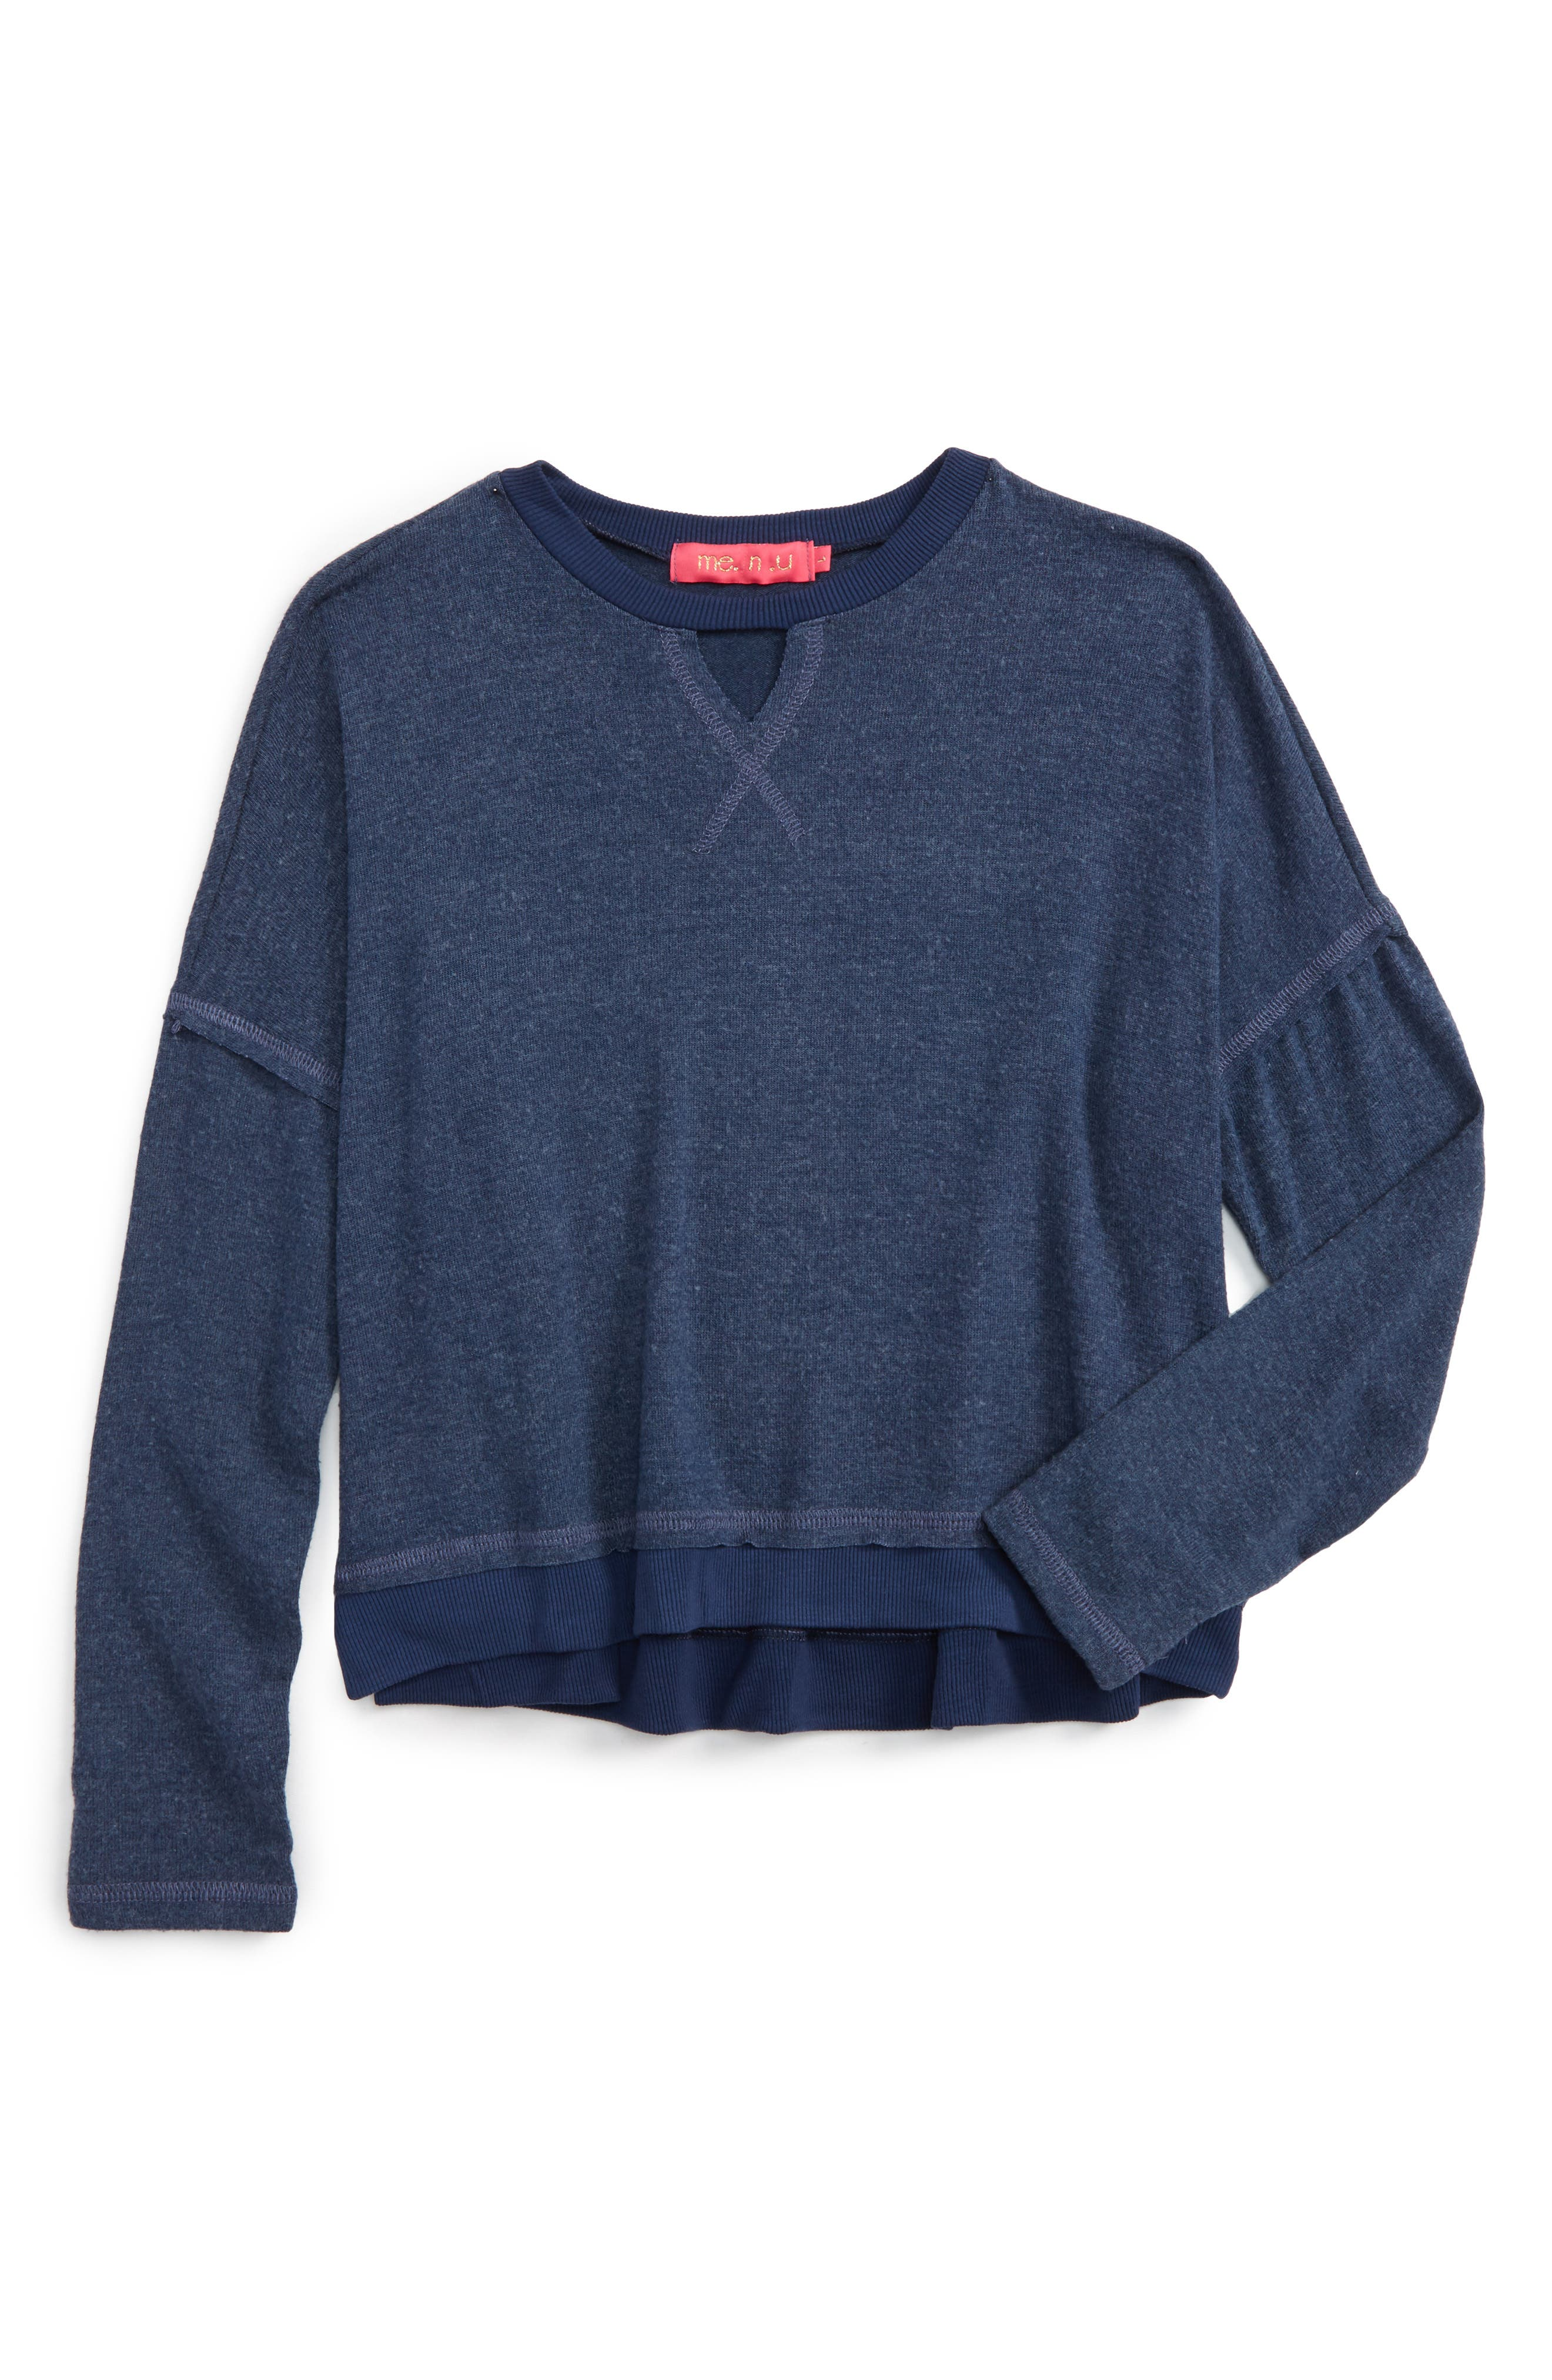 ME.N.U Gigi Cutout Sweatshirt